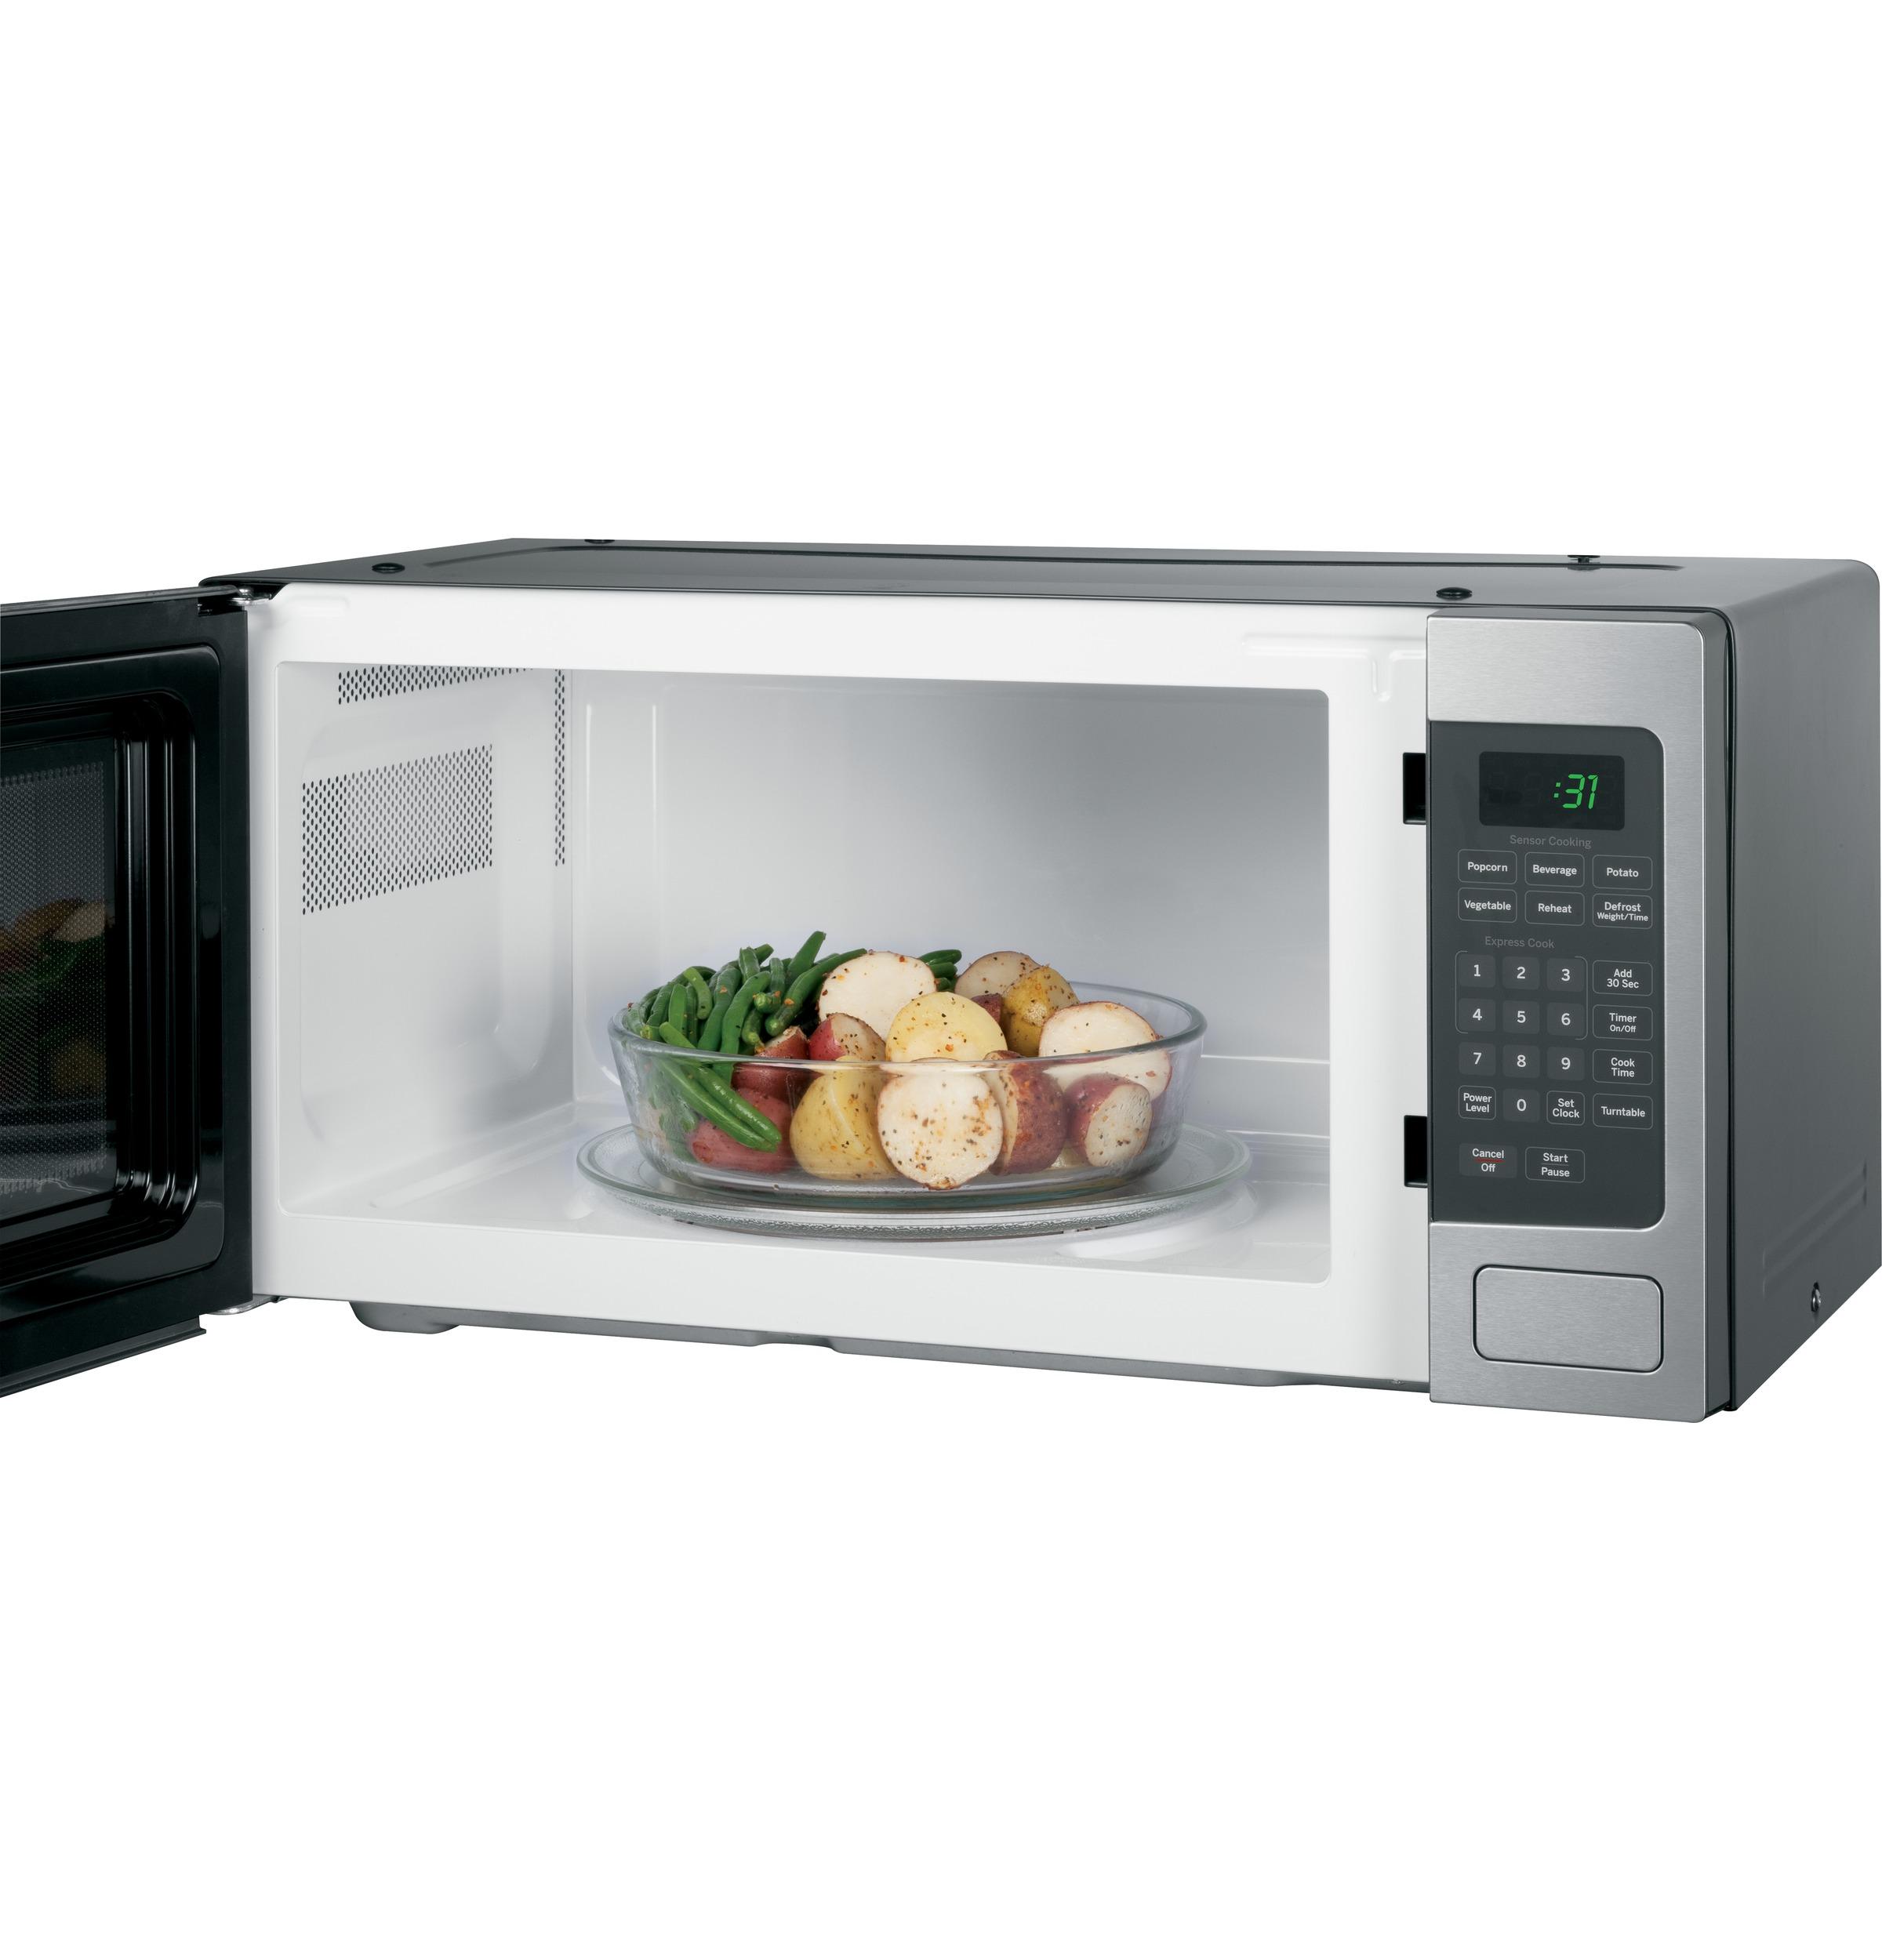 Model: PEM31SFSS | GE Profile GE Profile™ 1.1 Cu. Ft. Countertop Microwave Oven